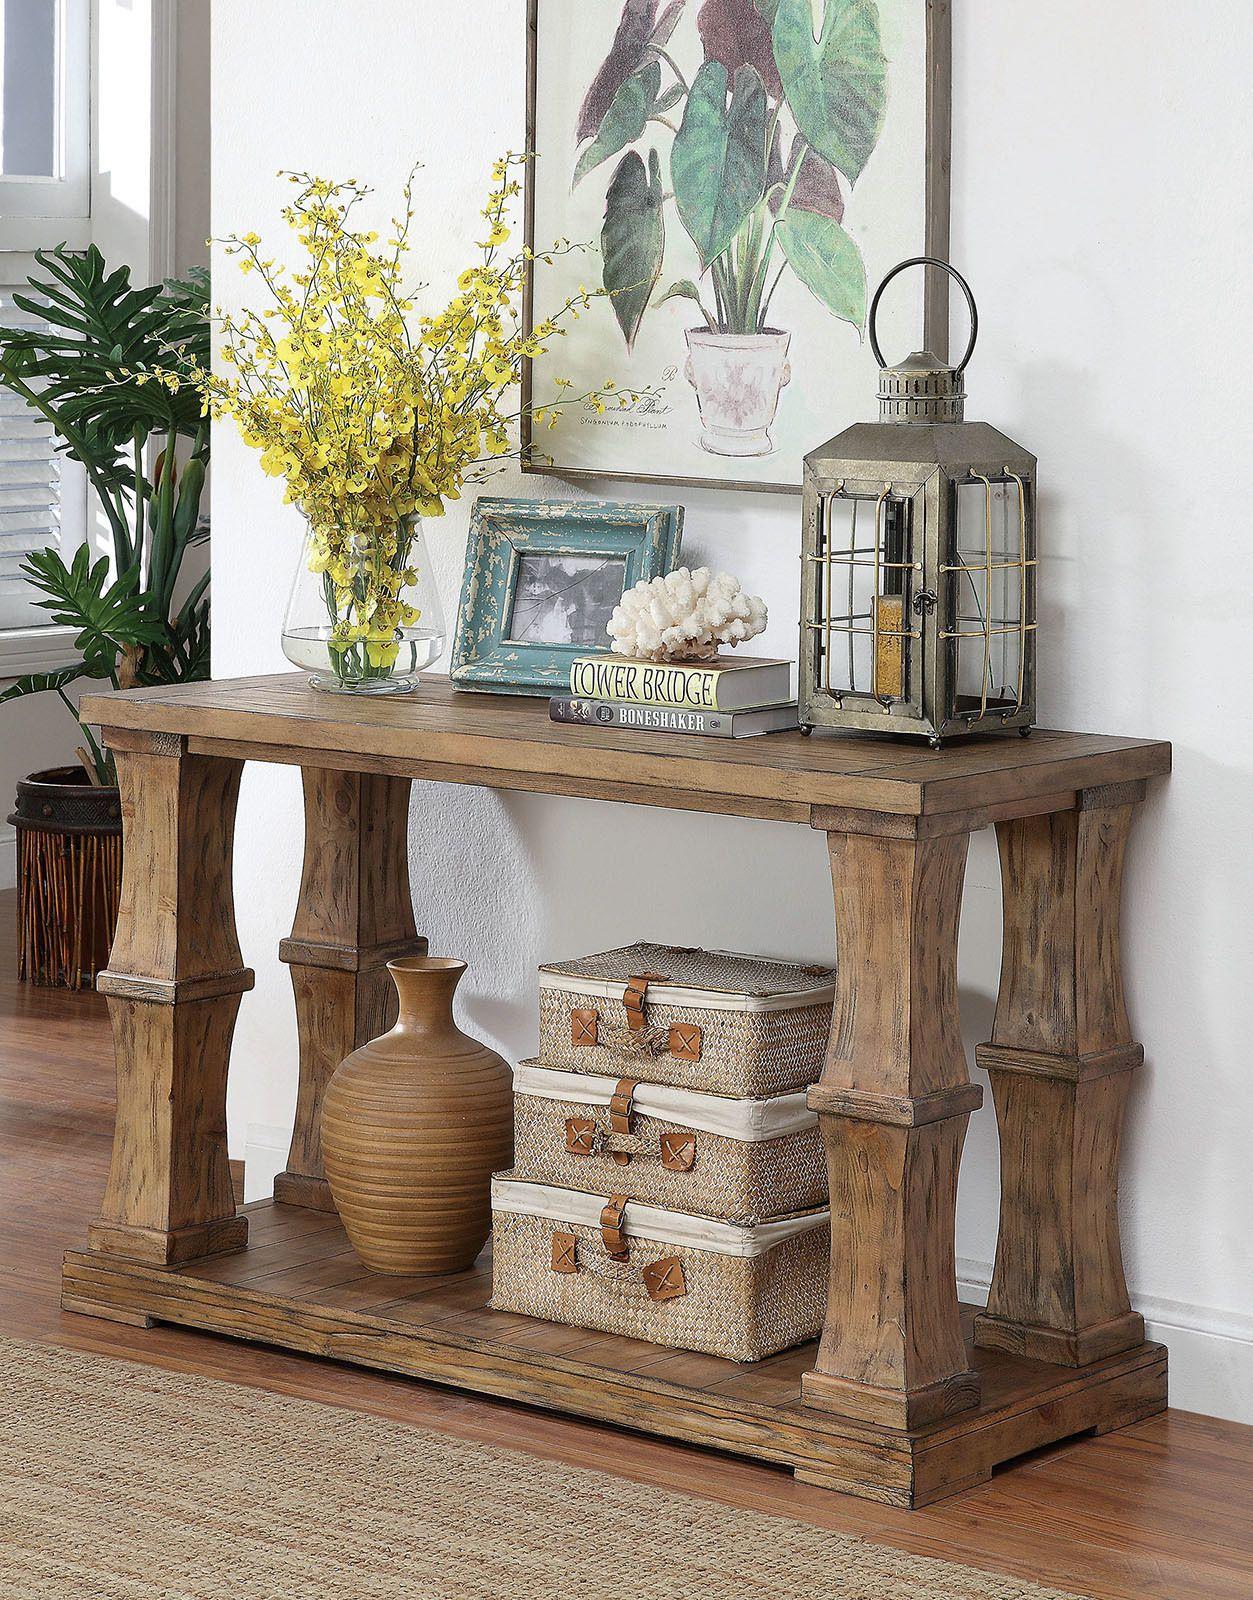 Granard Coffee Table Cm4457c Furniture Of America Coffee Tables Sofa Table Decor Farmhouse Sofa Table Decor [ 1600 x 1253 Pixel ]